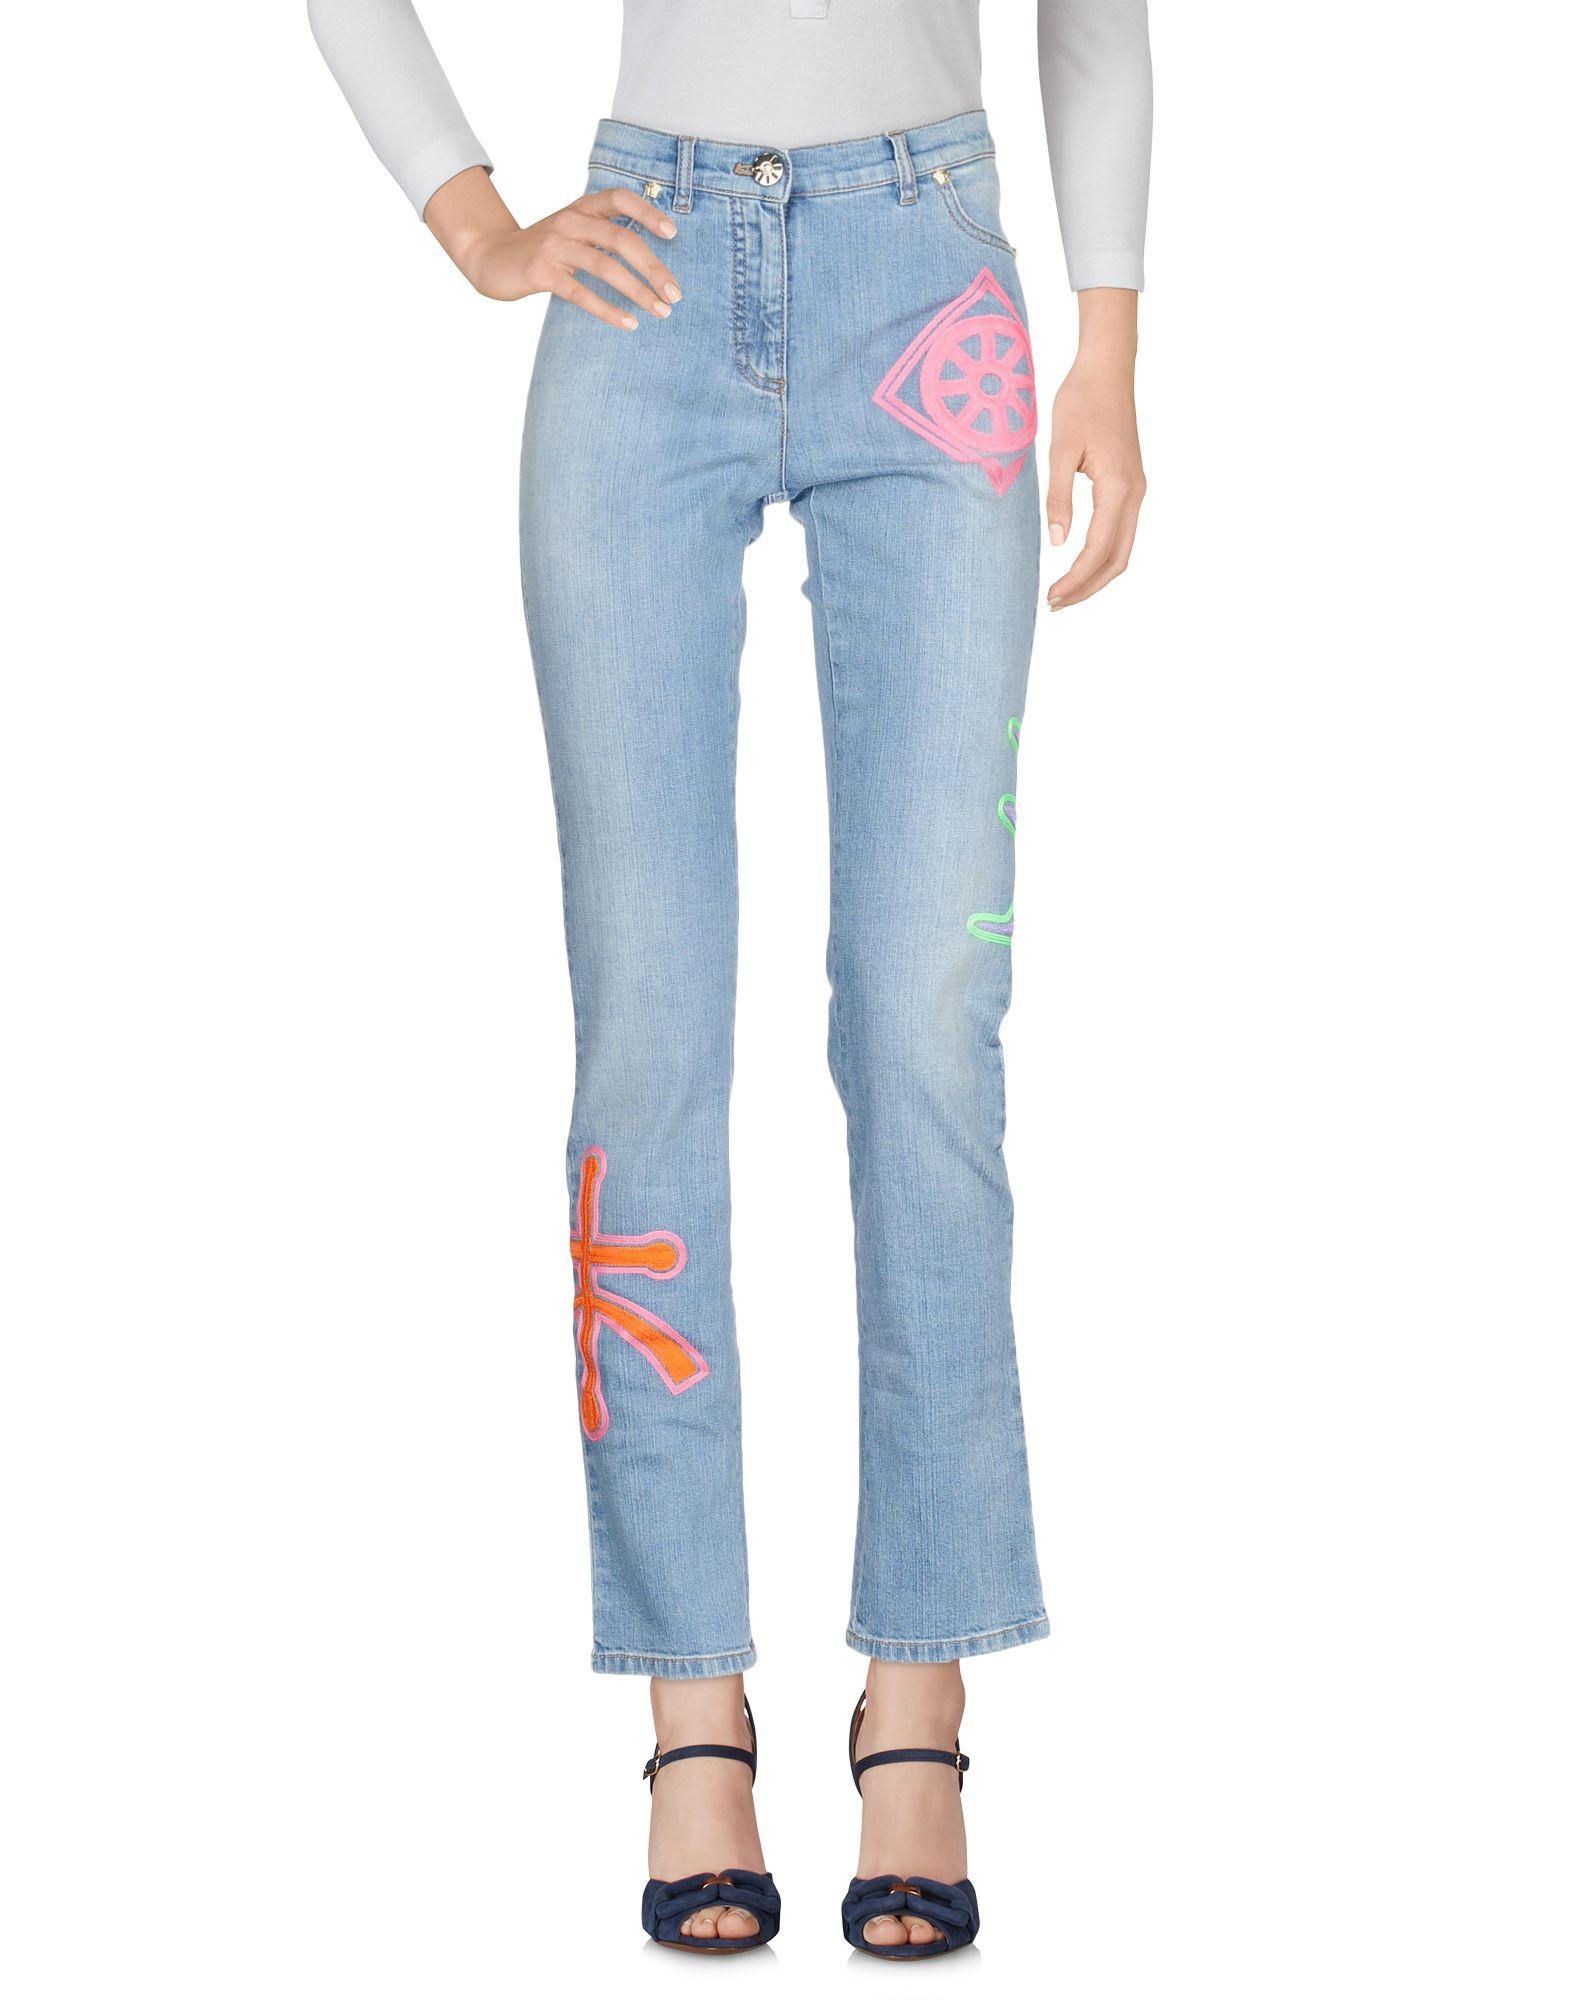 183a448e7391 Pantalon En Jean Versace Femme - Pantalons En Jean Versace sur YOOX -  42667469MB